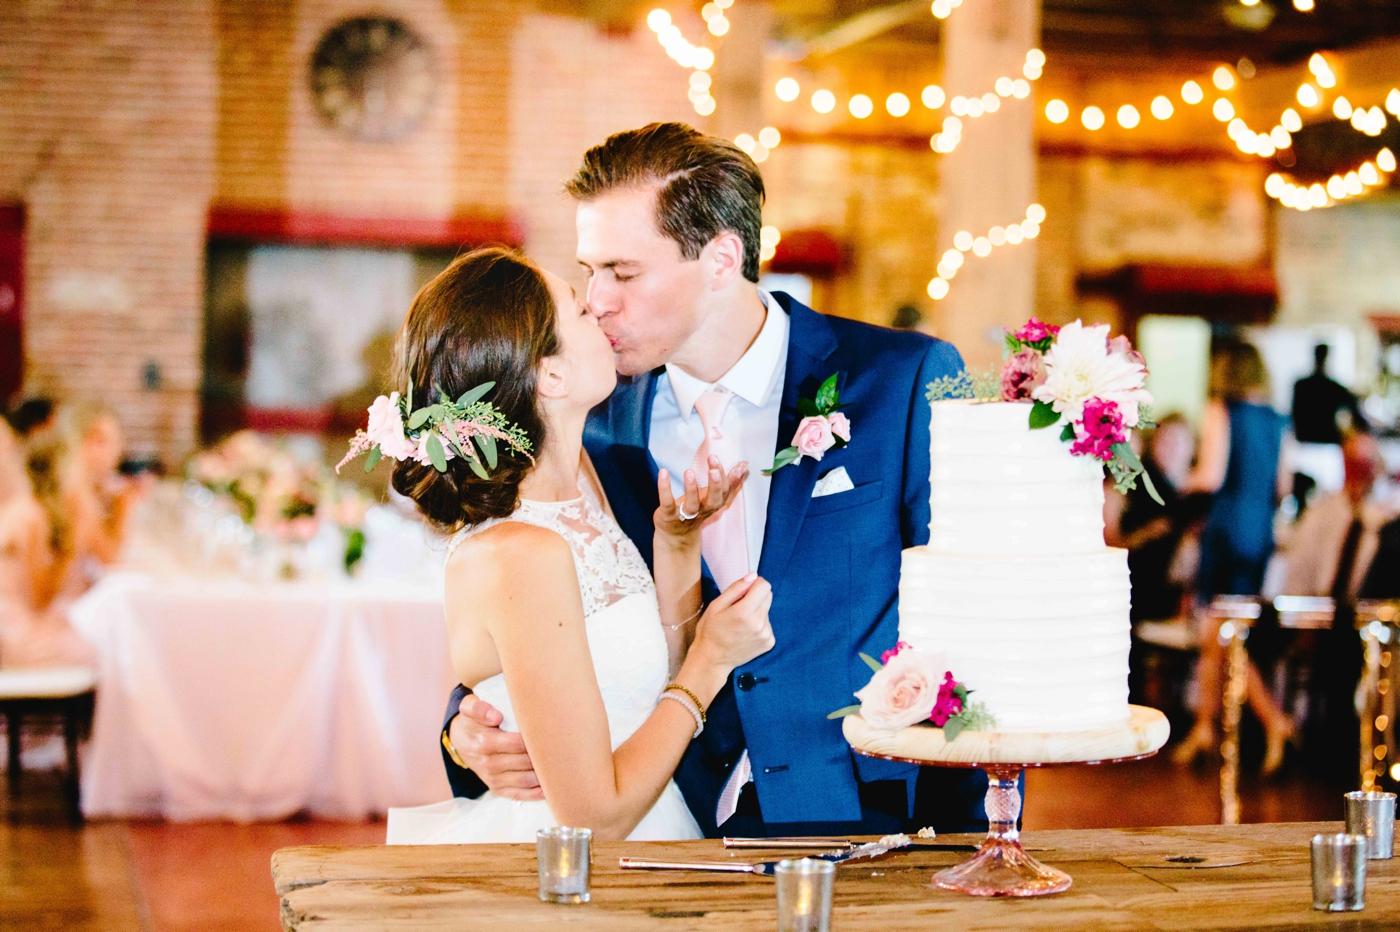 chicago-fine-art-wedding-photography-tyma54